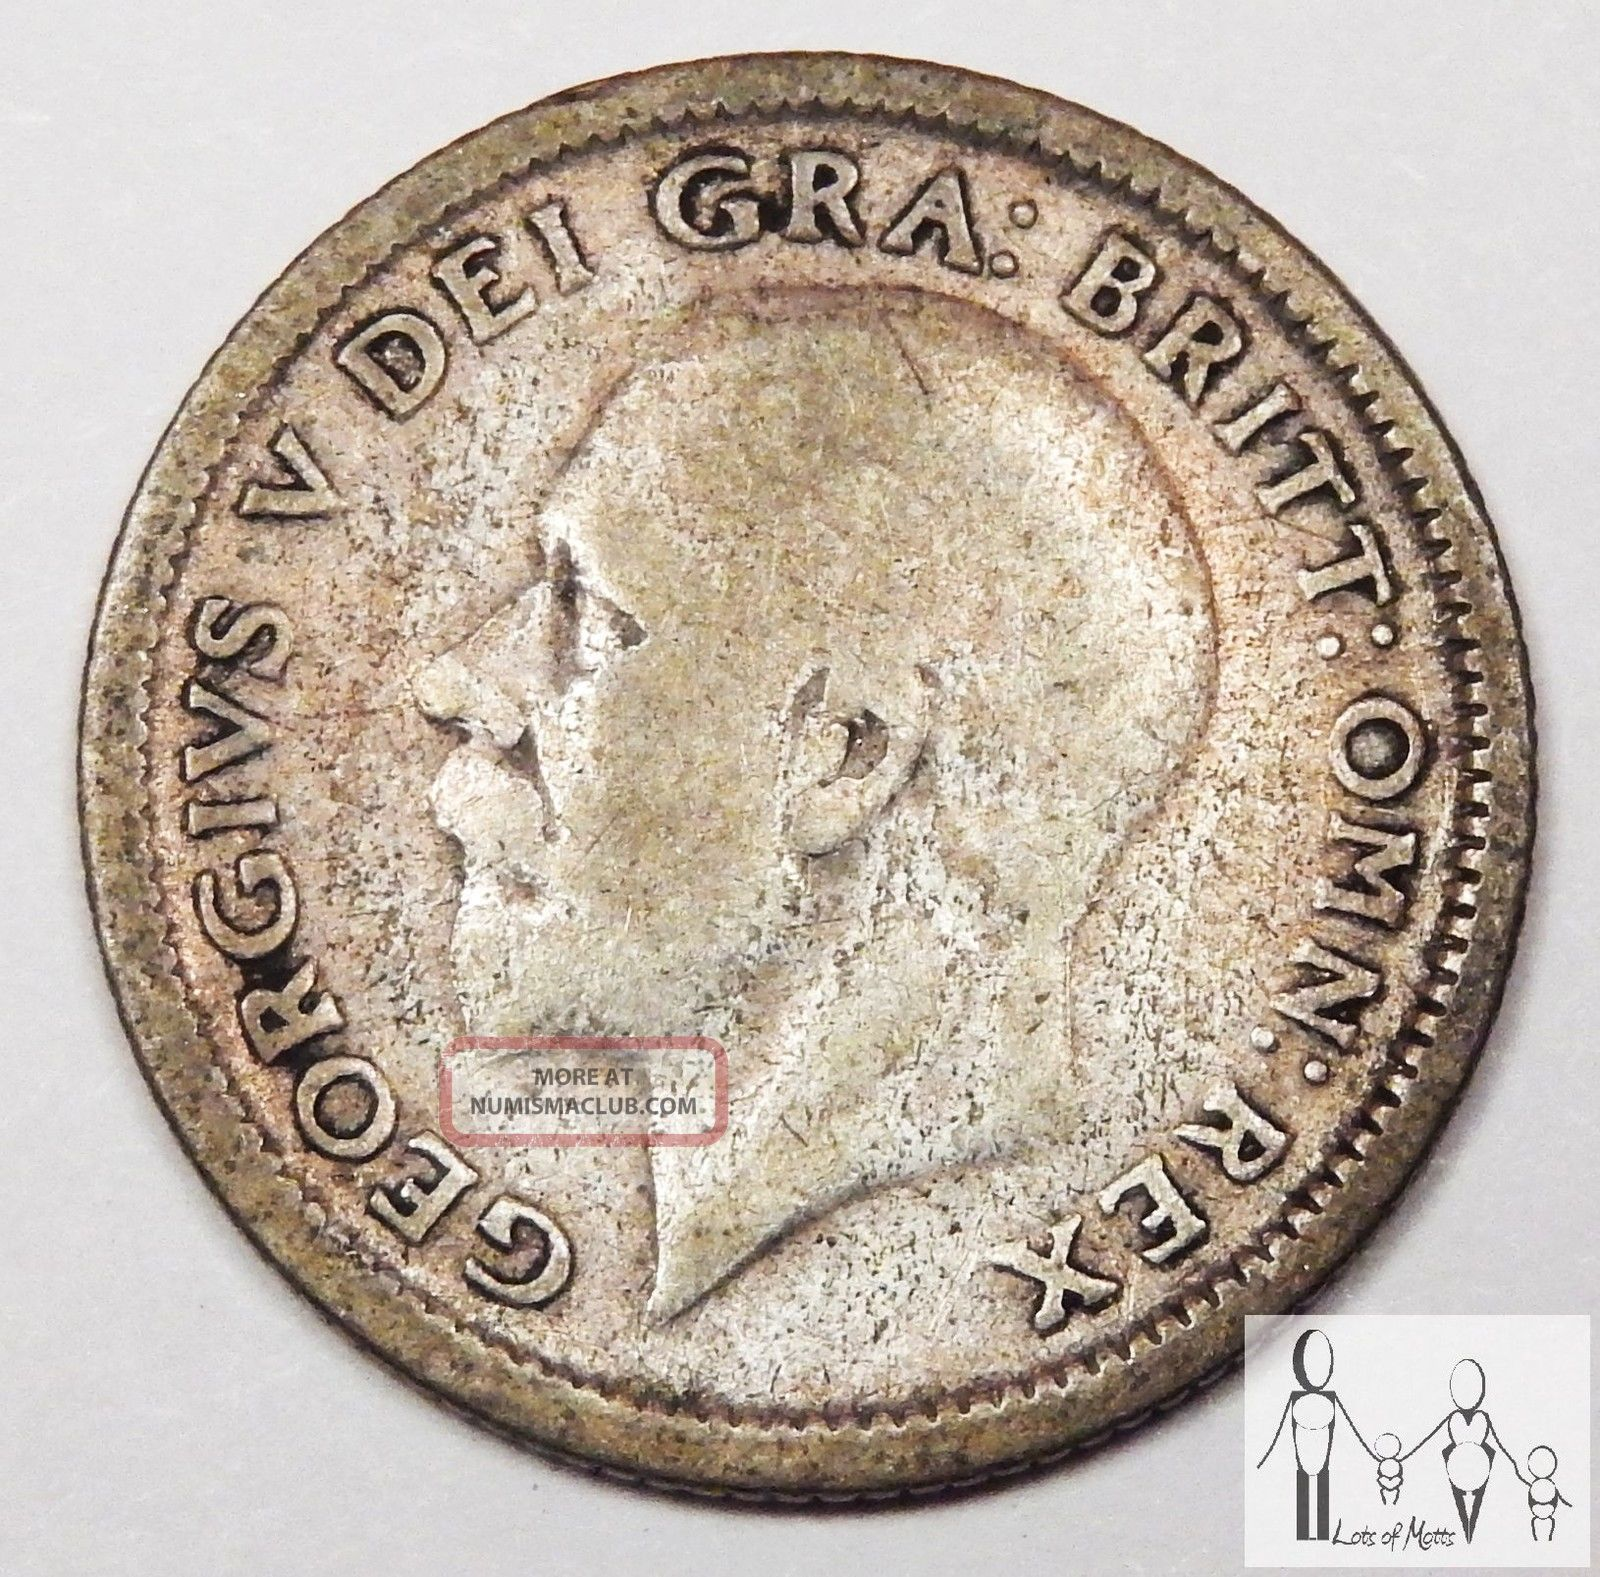 1926 Great Britain Good 6 Six Pence 50% Silver.  0455 Asw B84 UK (Great Britain) photo